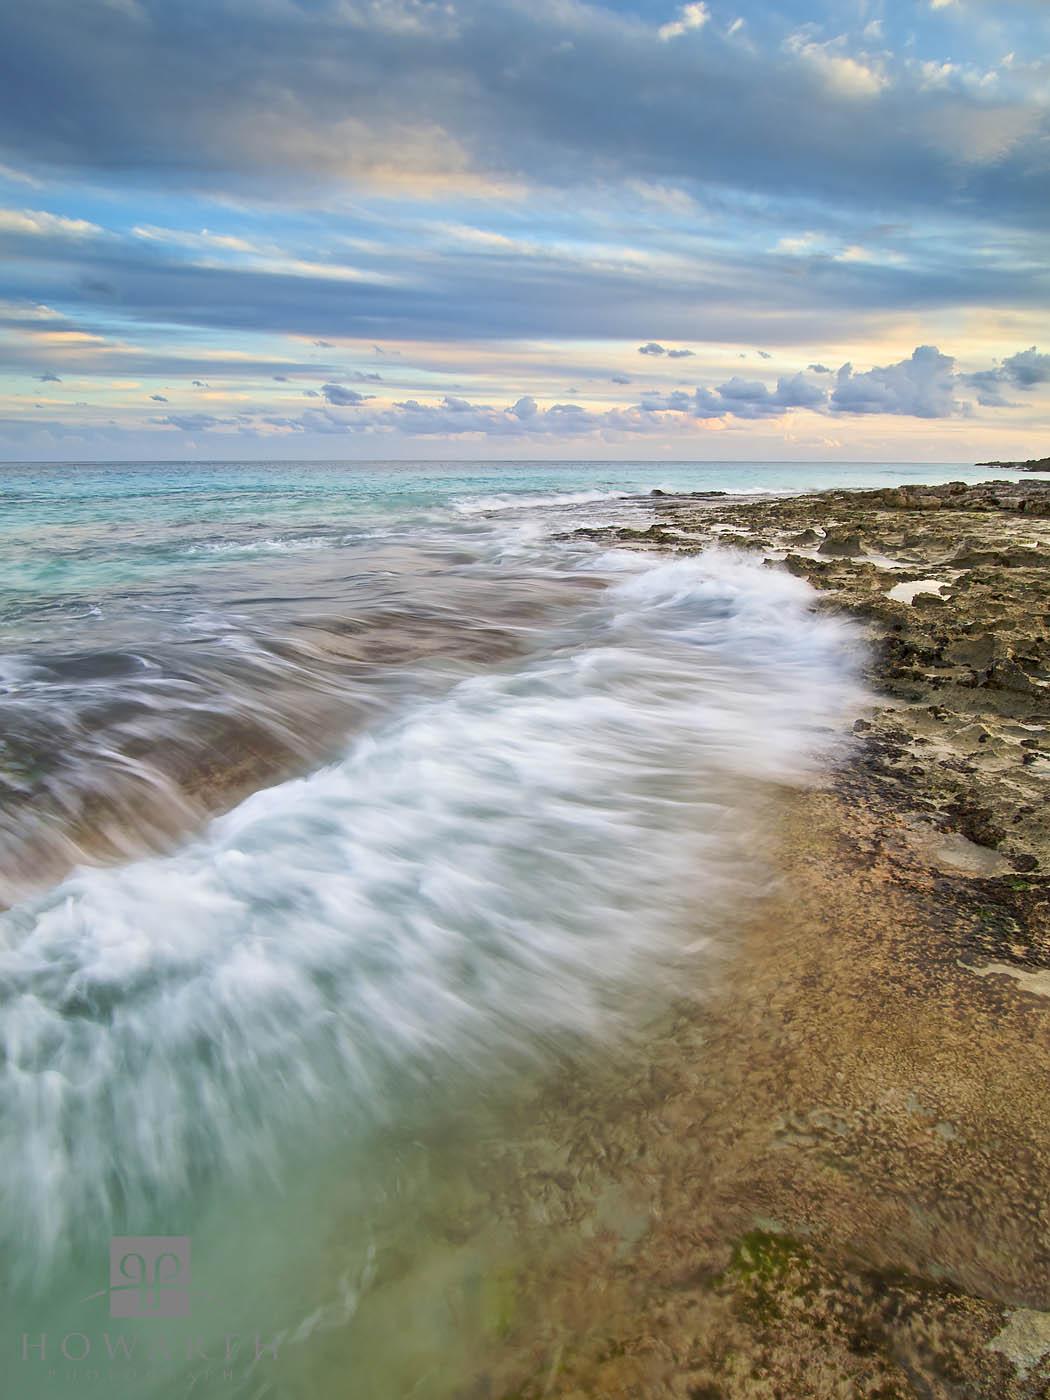 rush, wave, incoming, swoosh, sweeps, grape, bay, paget, photo